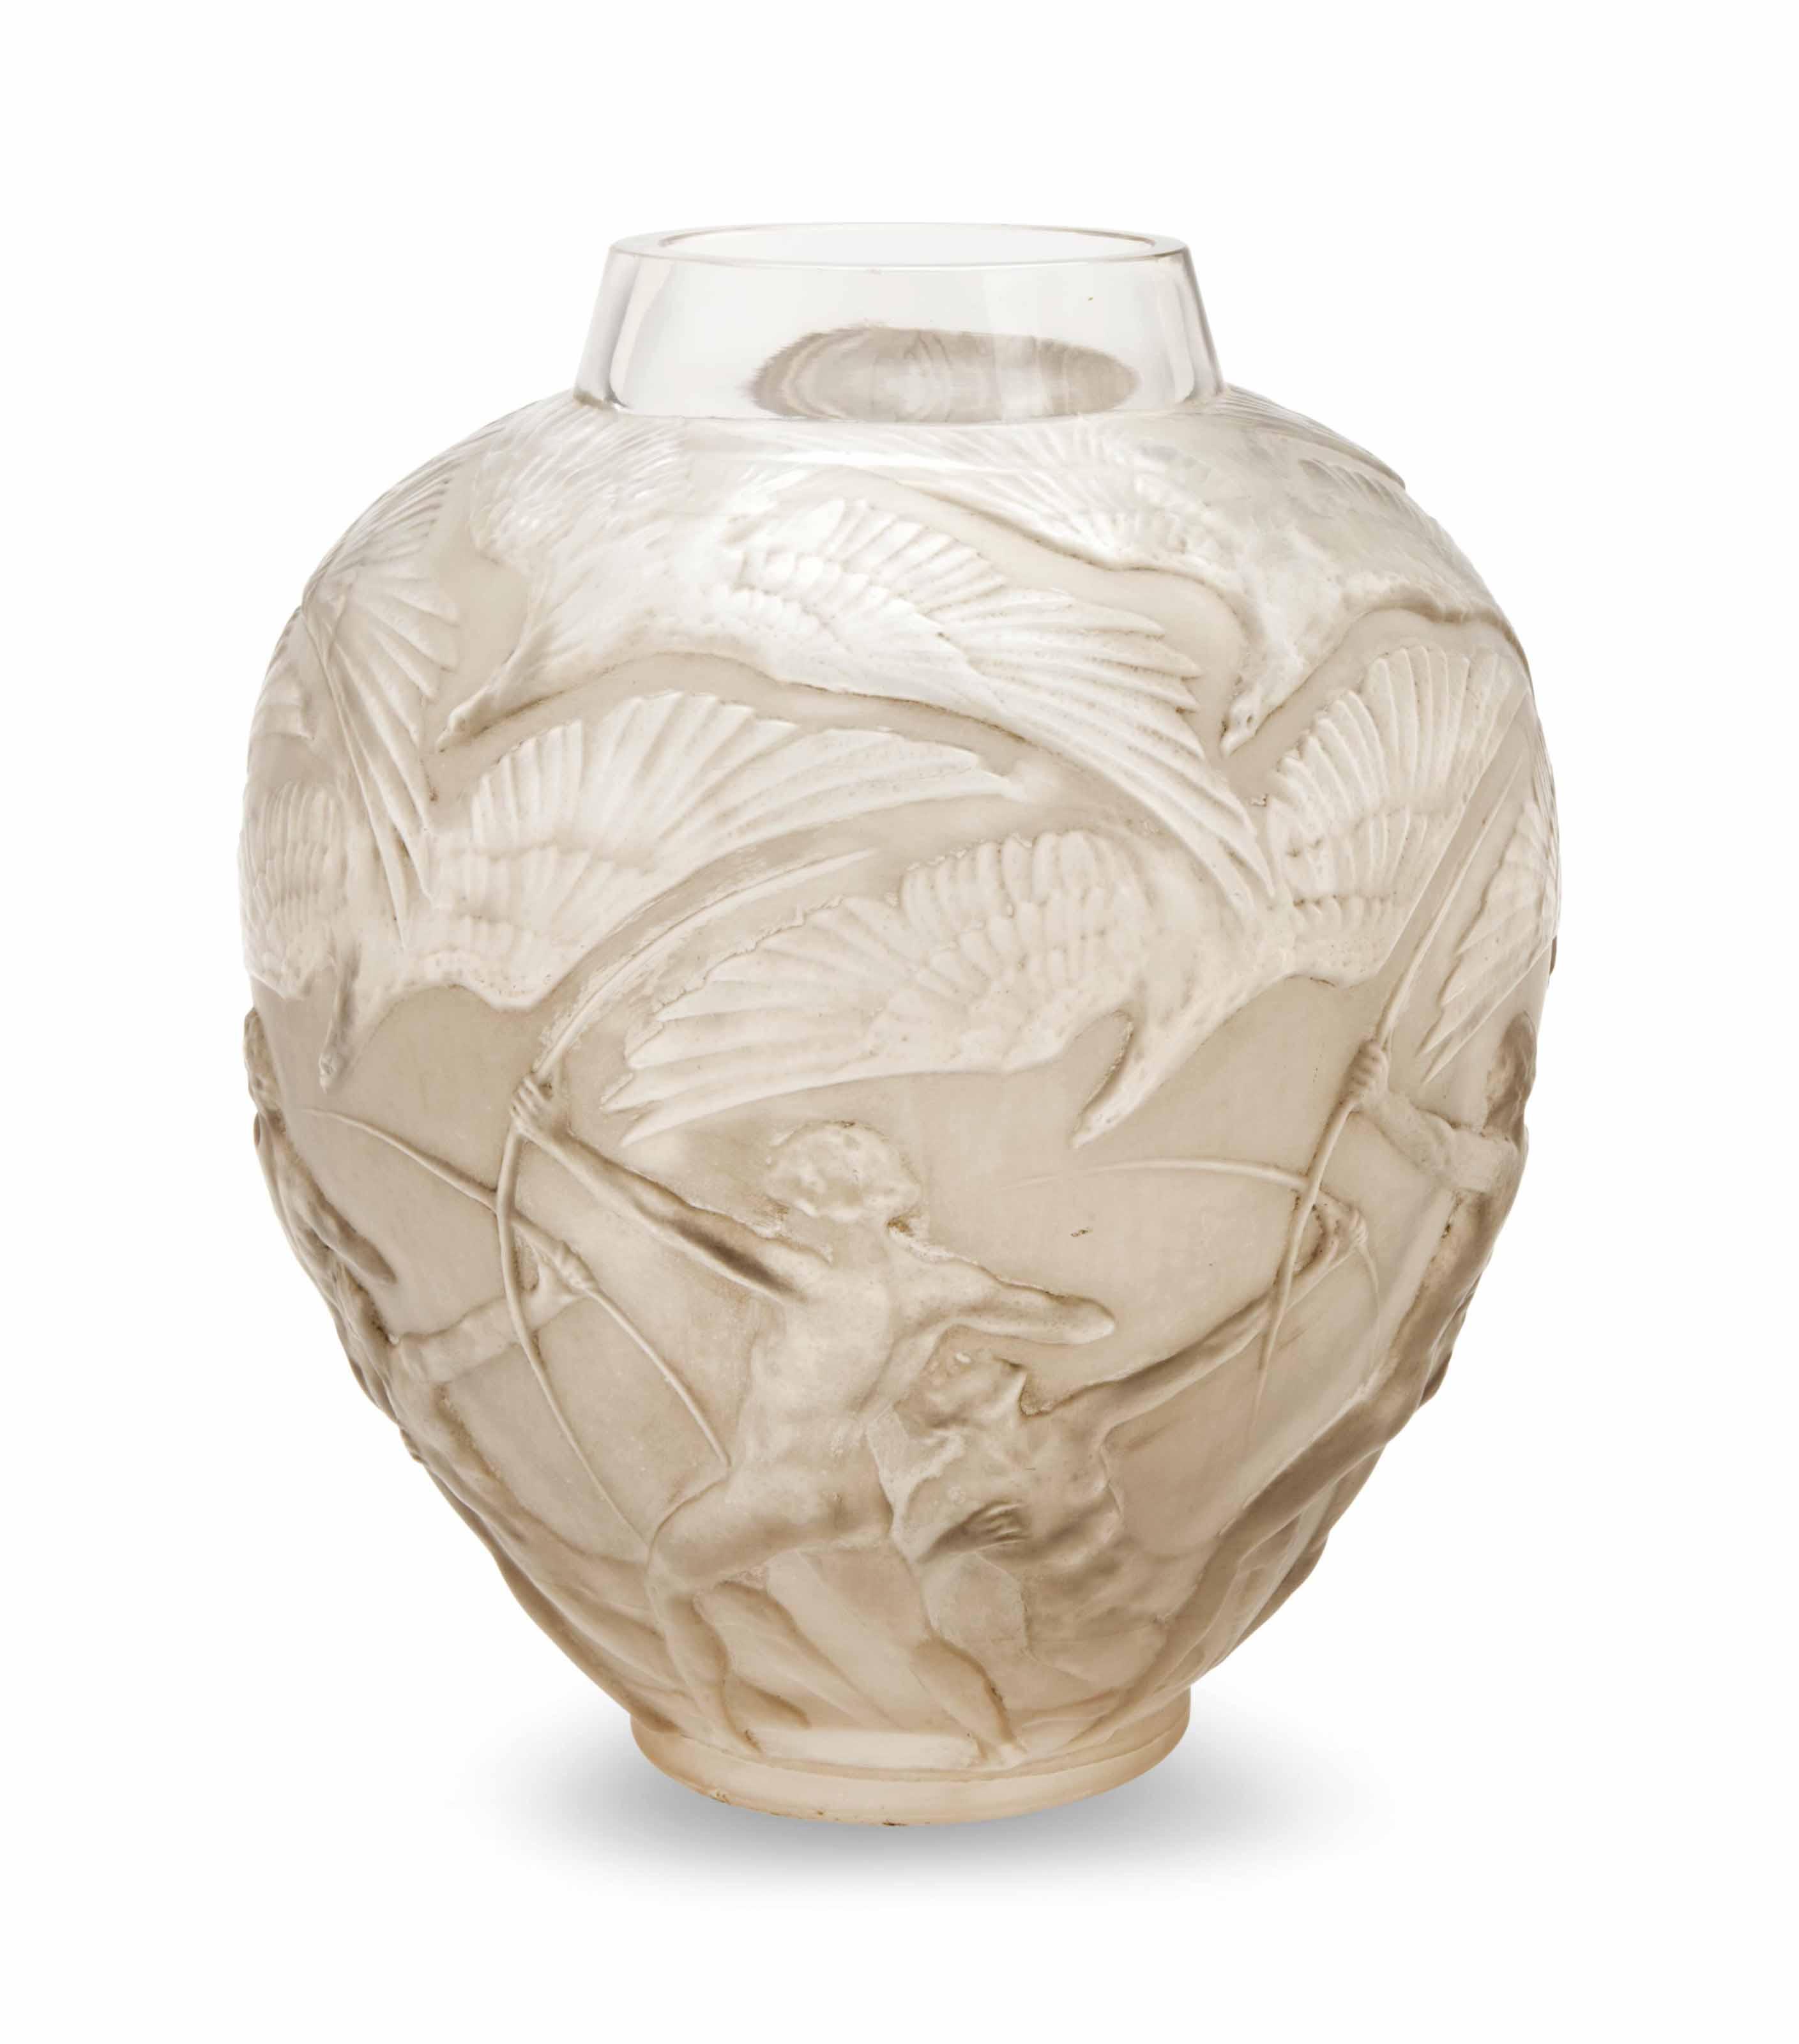 A FRENCH GLASS ARCHER VASE